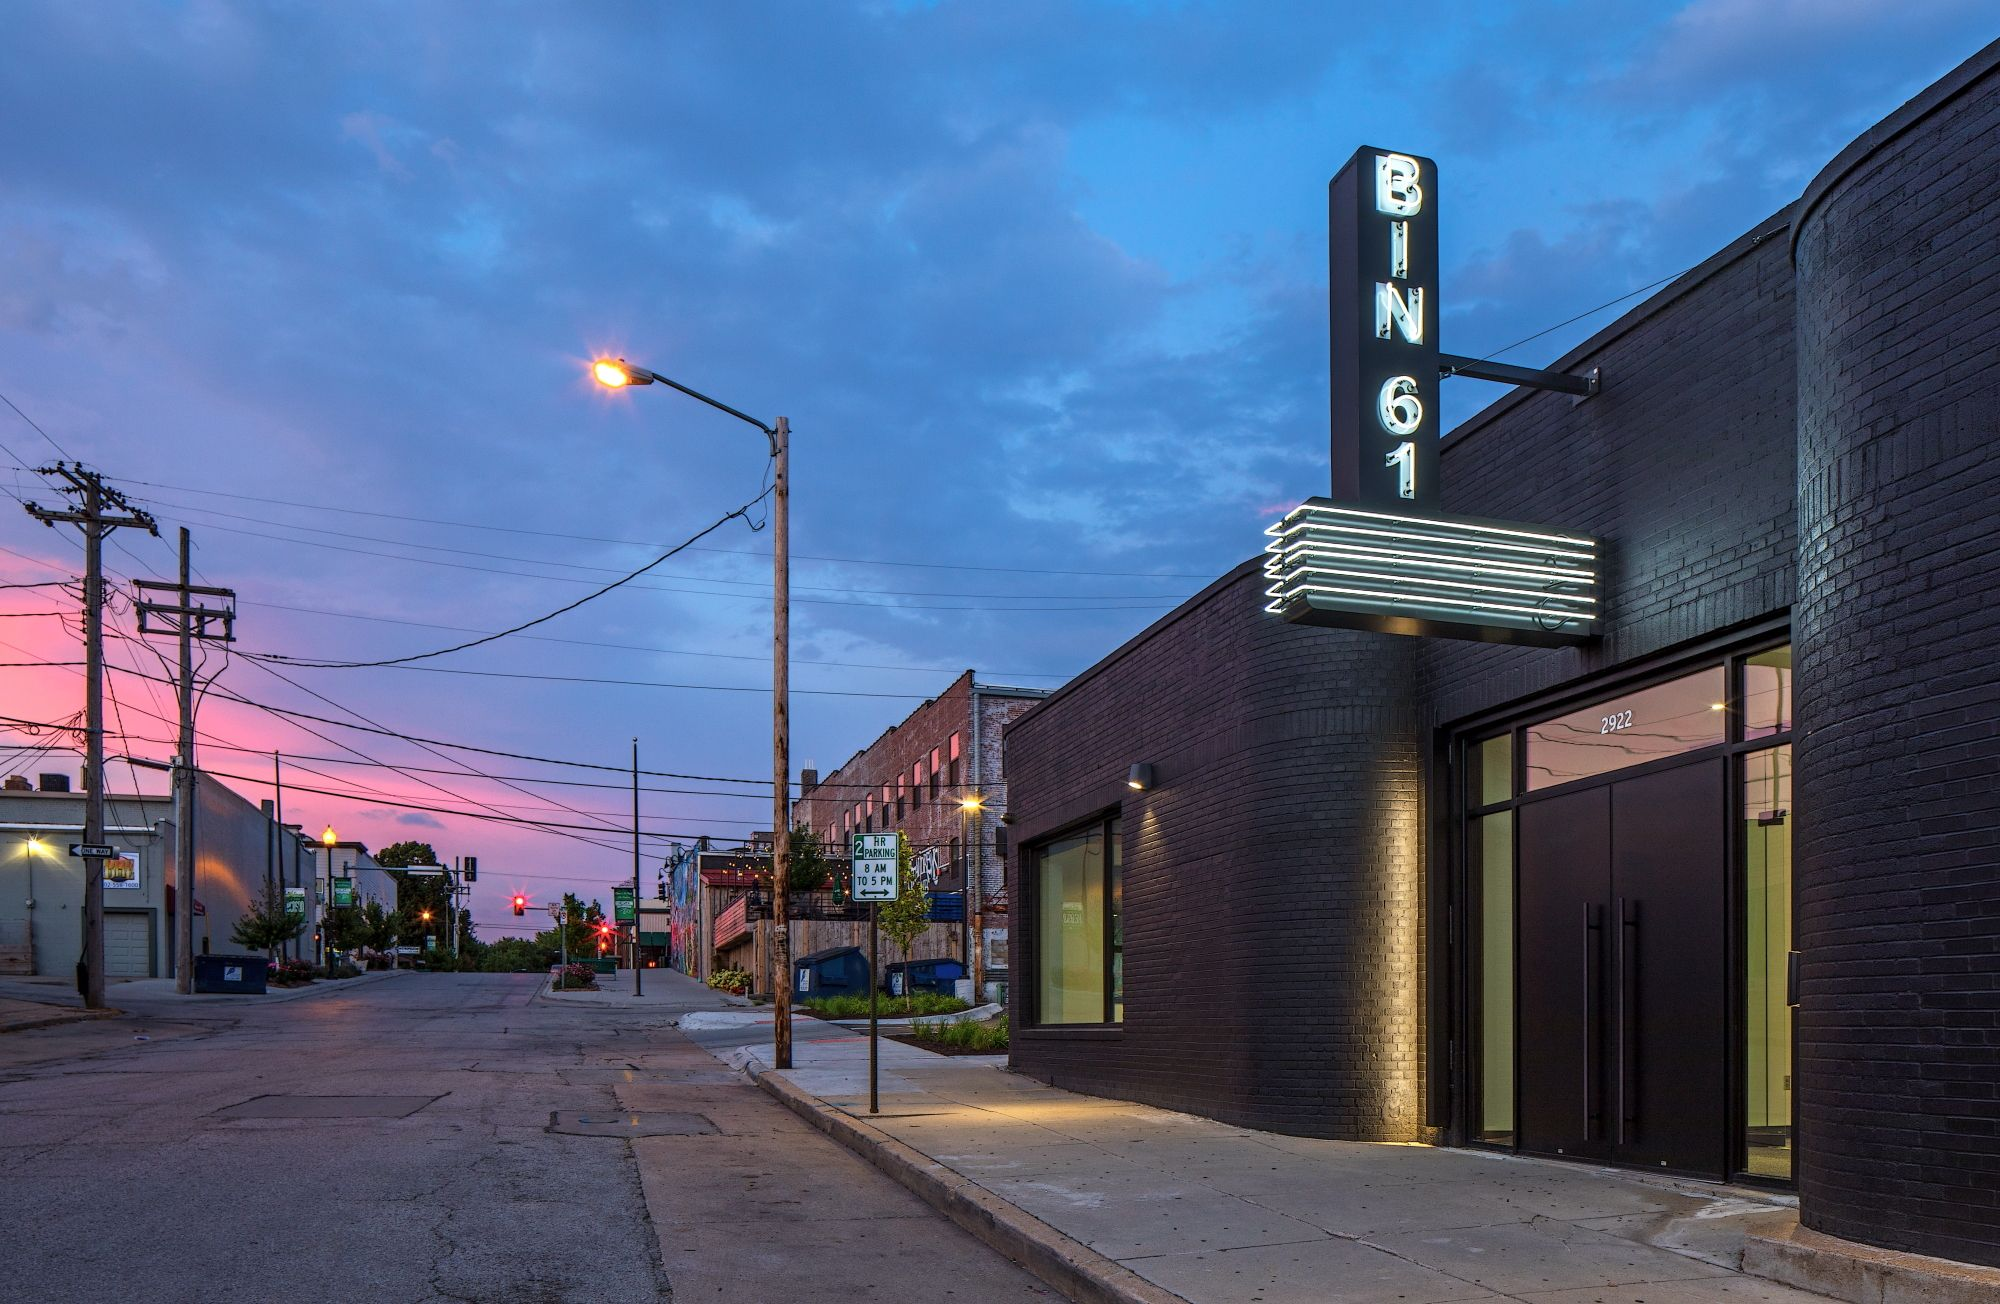 Bin61 Tack Architects Architect Facade Lighting Beautiful Buildings